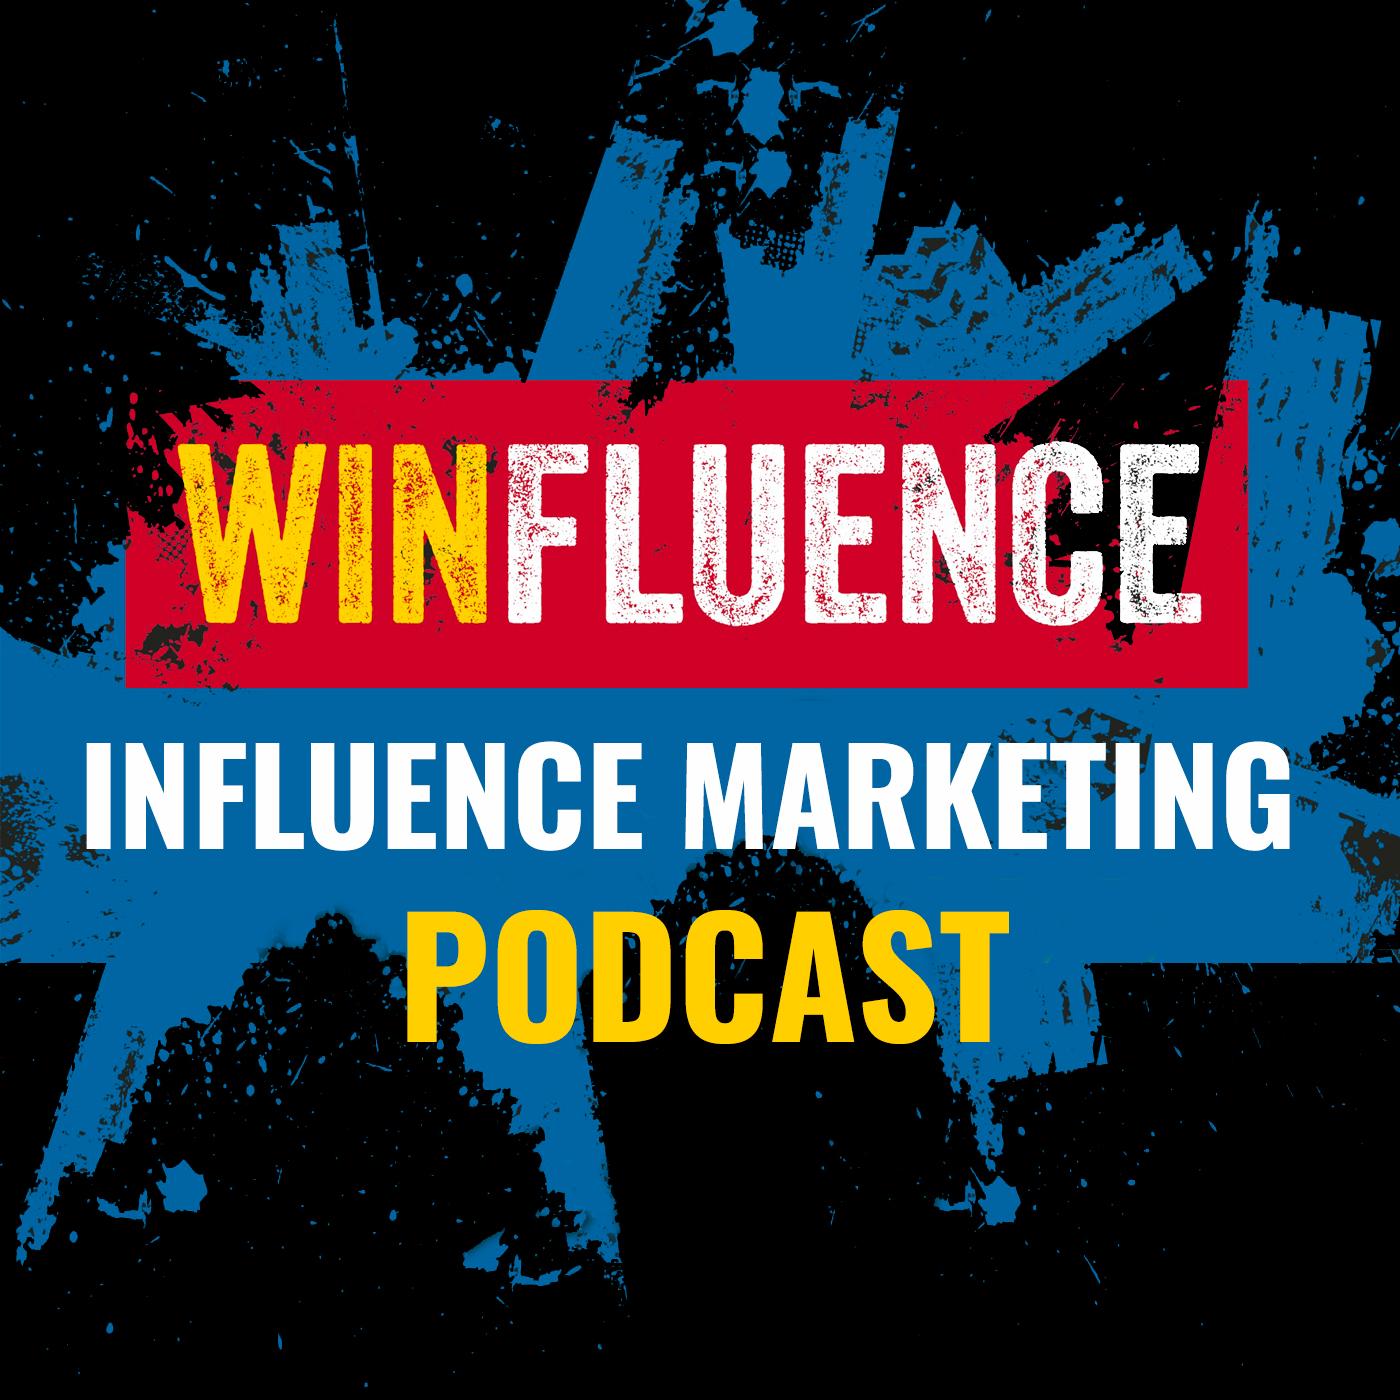 Winfluence - The Influence Marketing Podcast show art